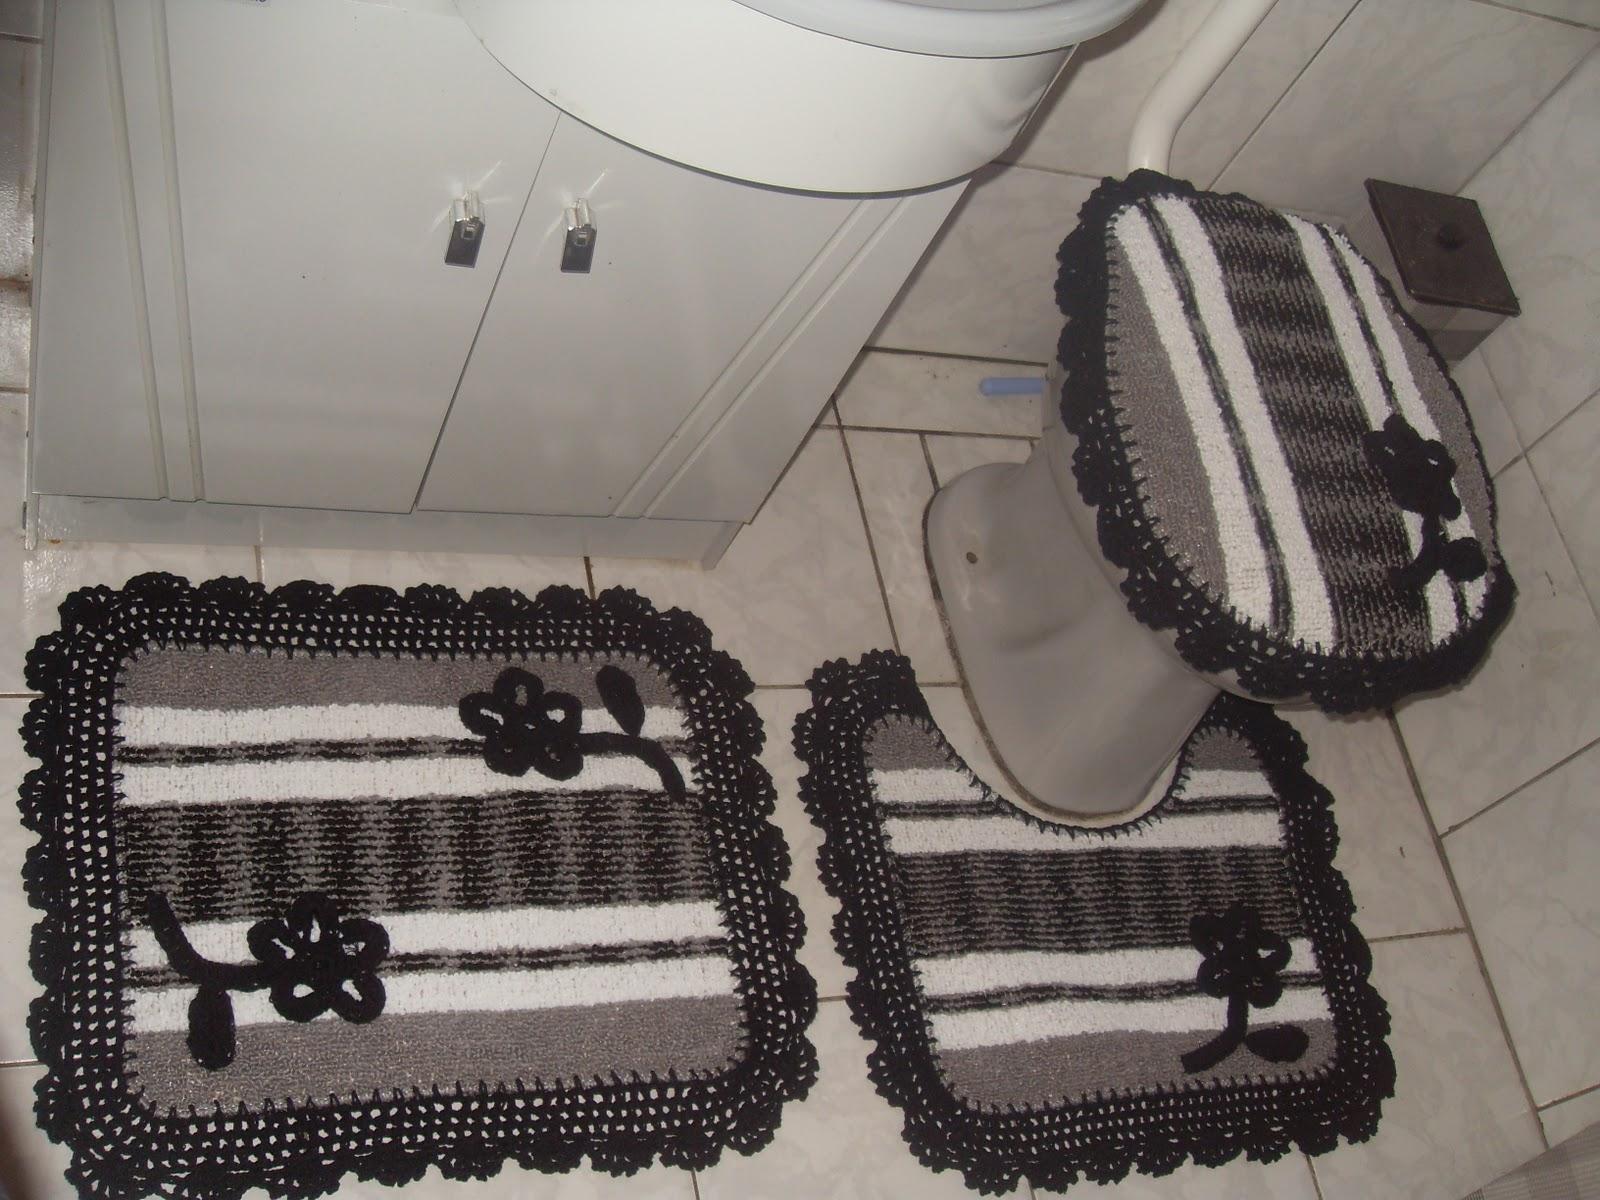 Nina Crochê: Jogo de banheiro emborrachado #6F665C 1600x1200 Banheiro Cor Preto E Branco